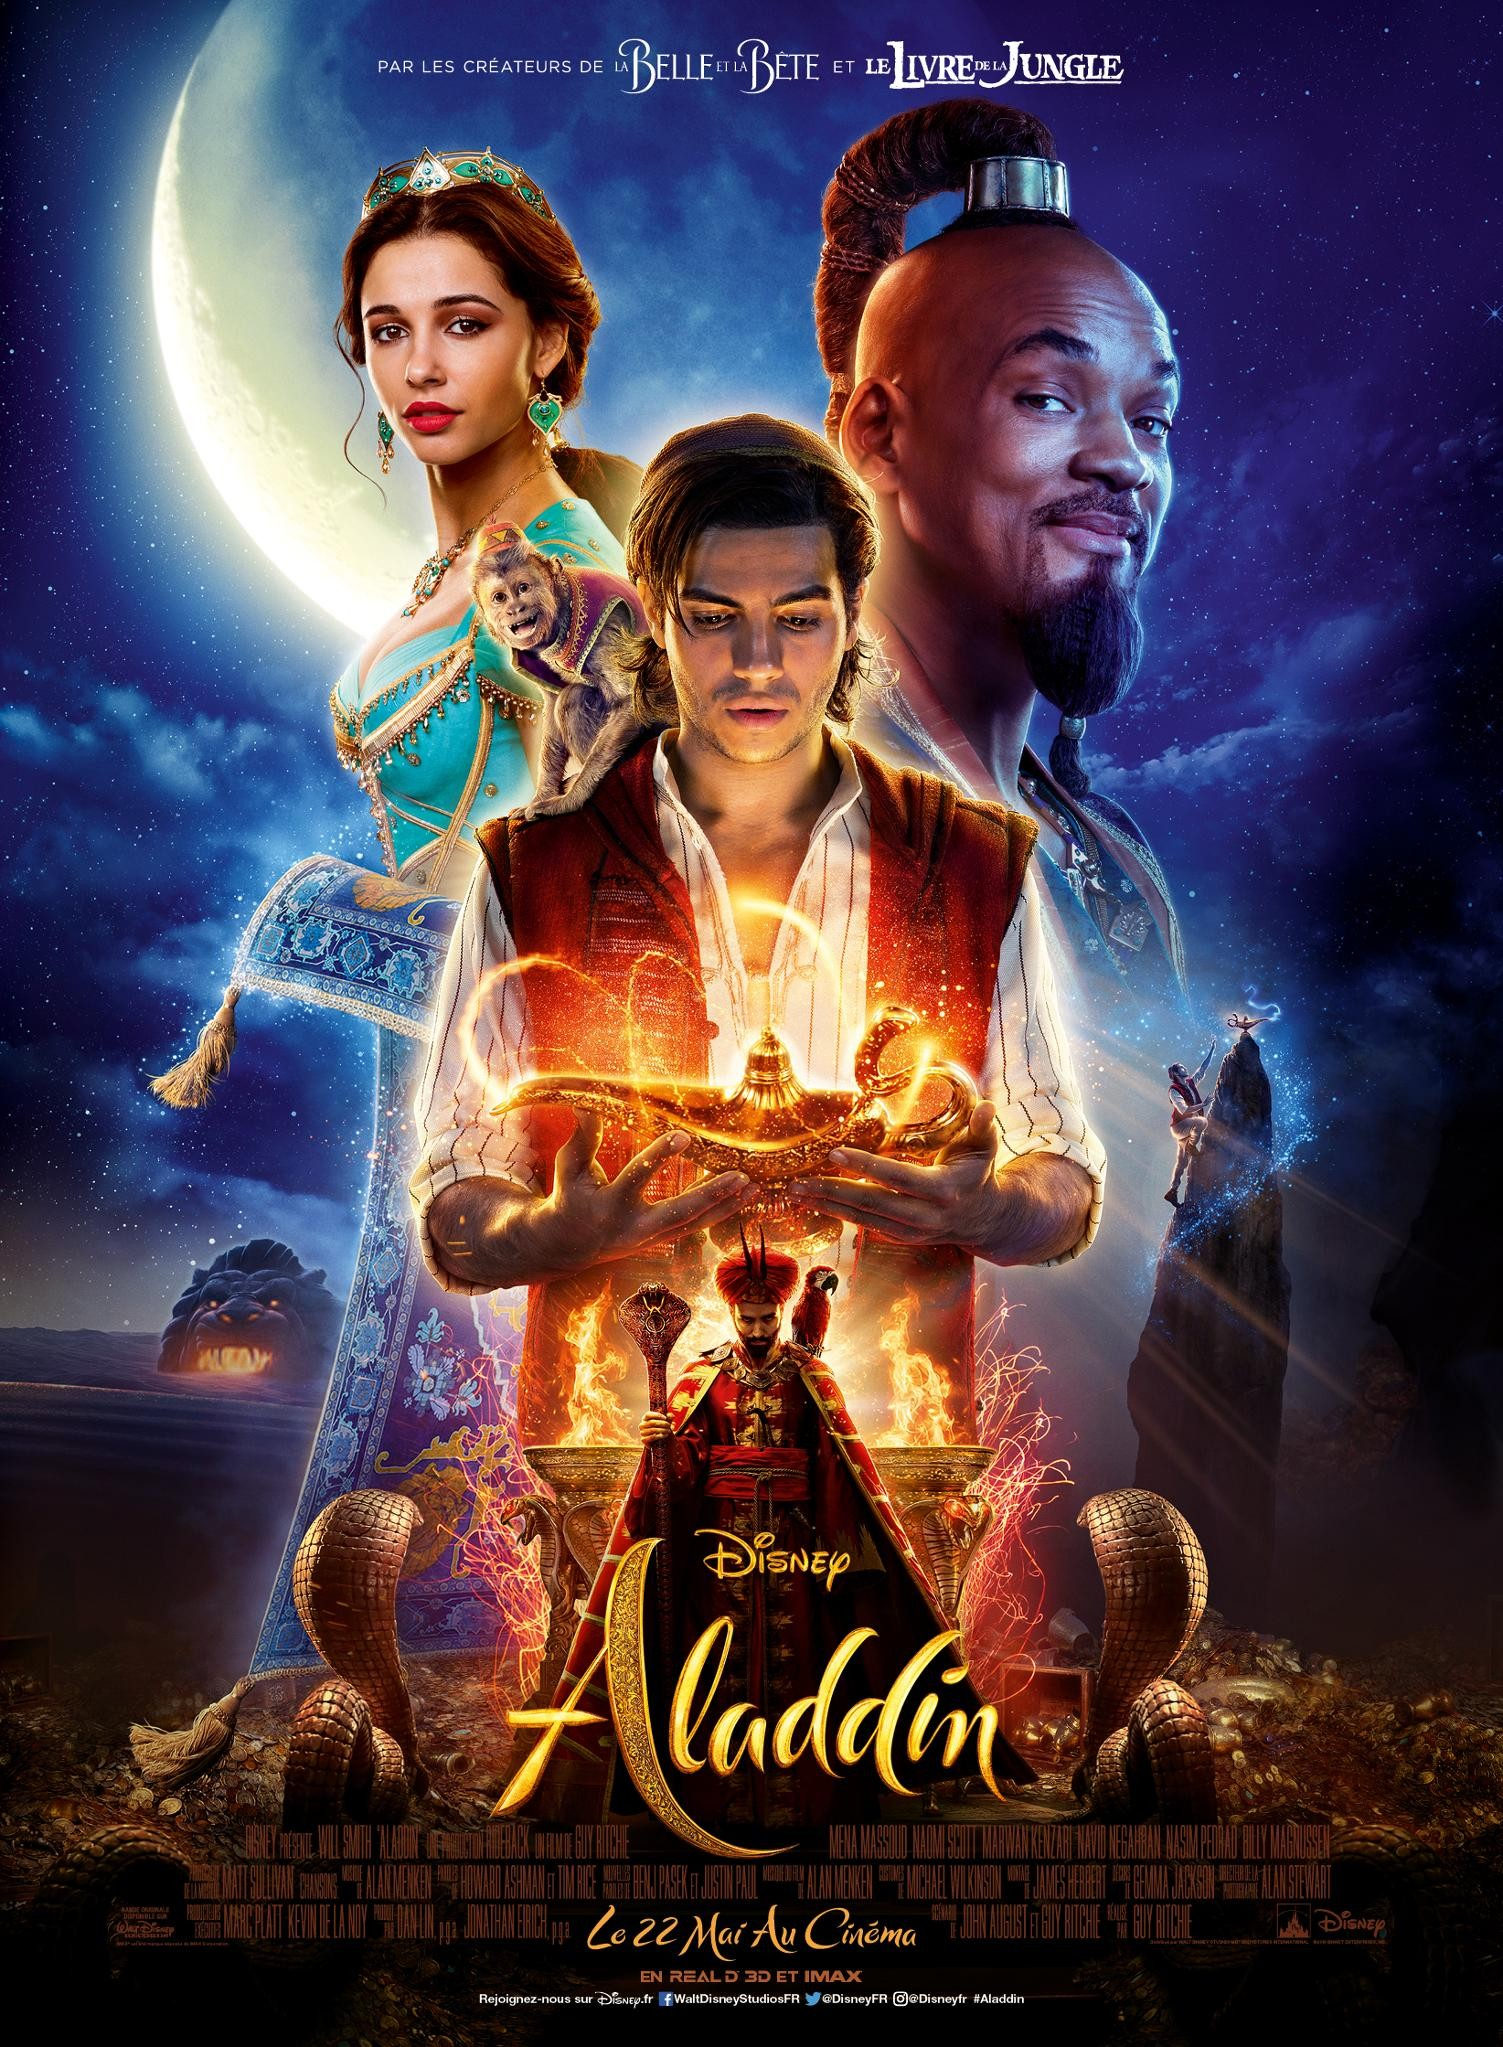 Quel personnage d''Aladdin' es-tu ?